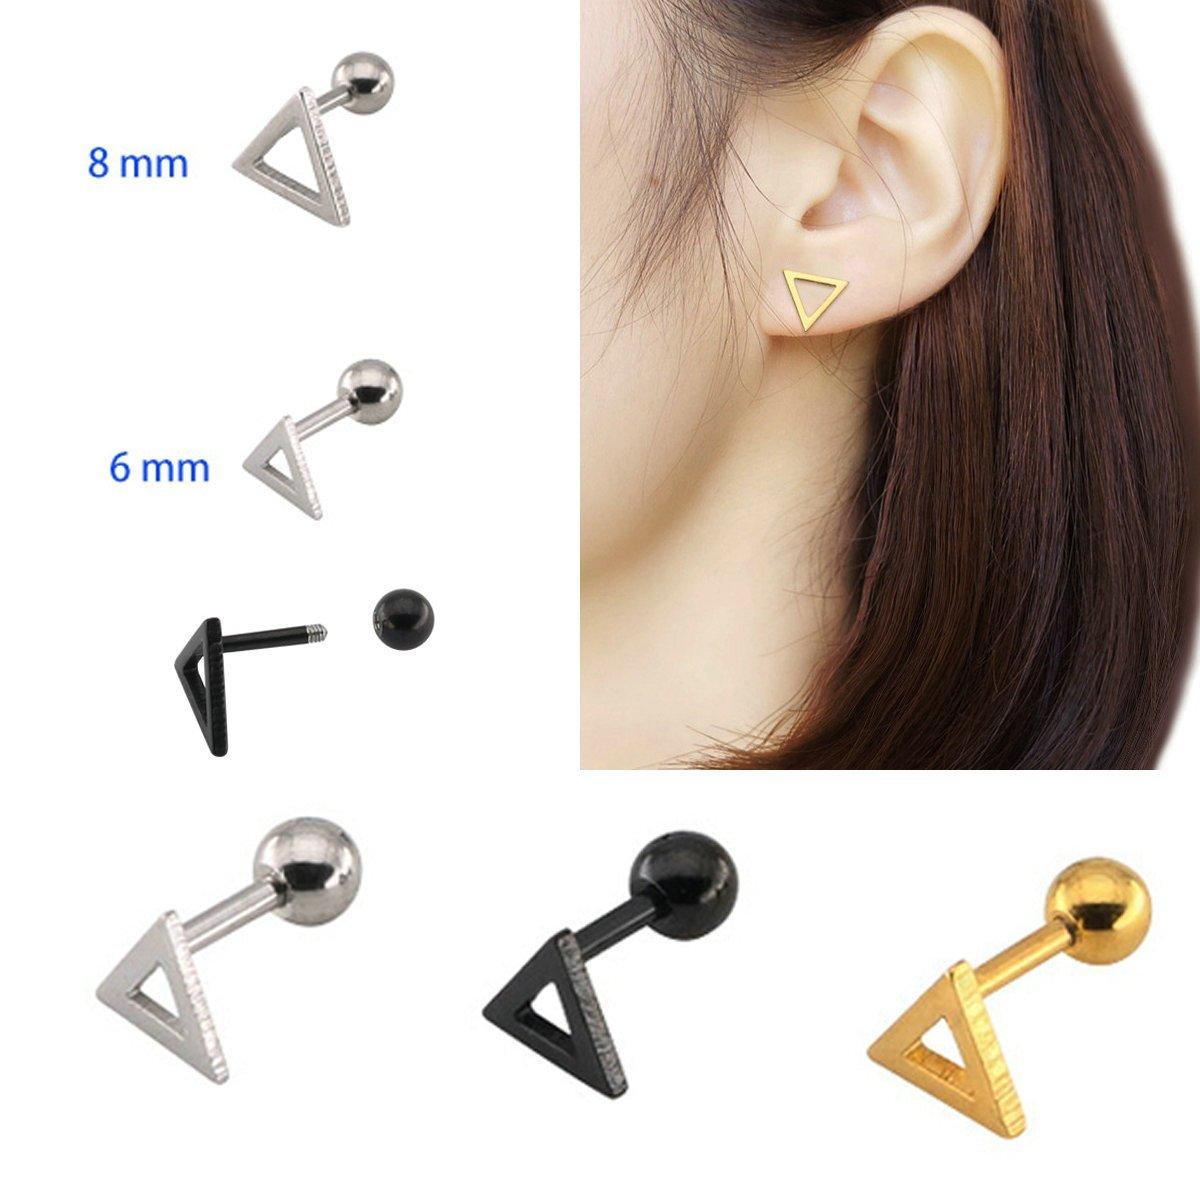 AnaZoz 3PCS Ball Earring Set Stainless Steel Screwback Triangle Stud Earrings Ball Back